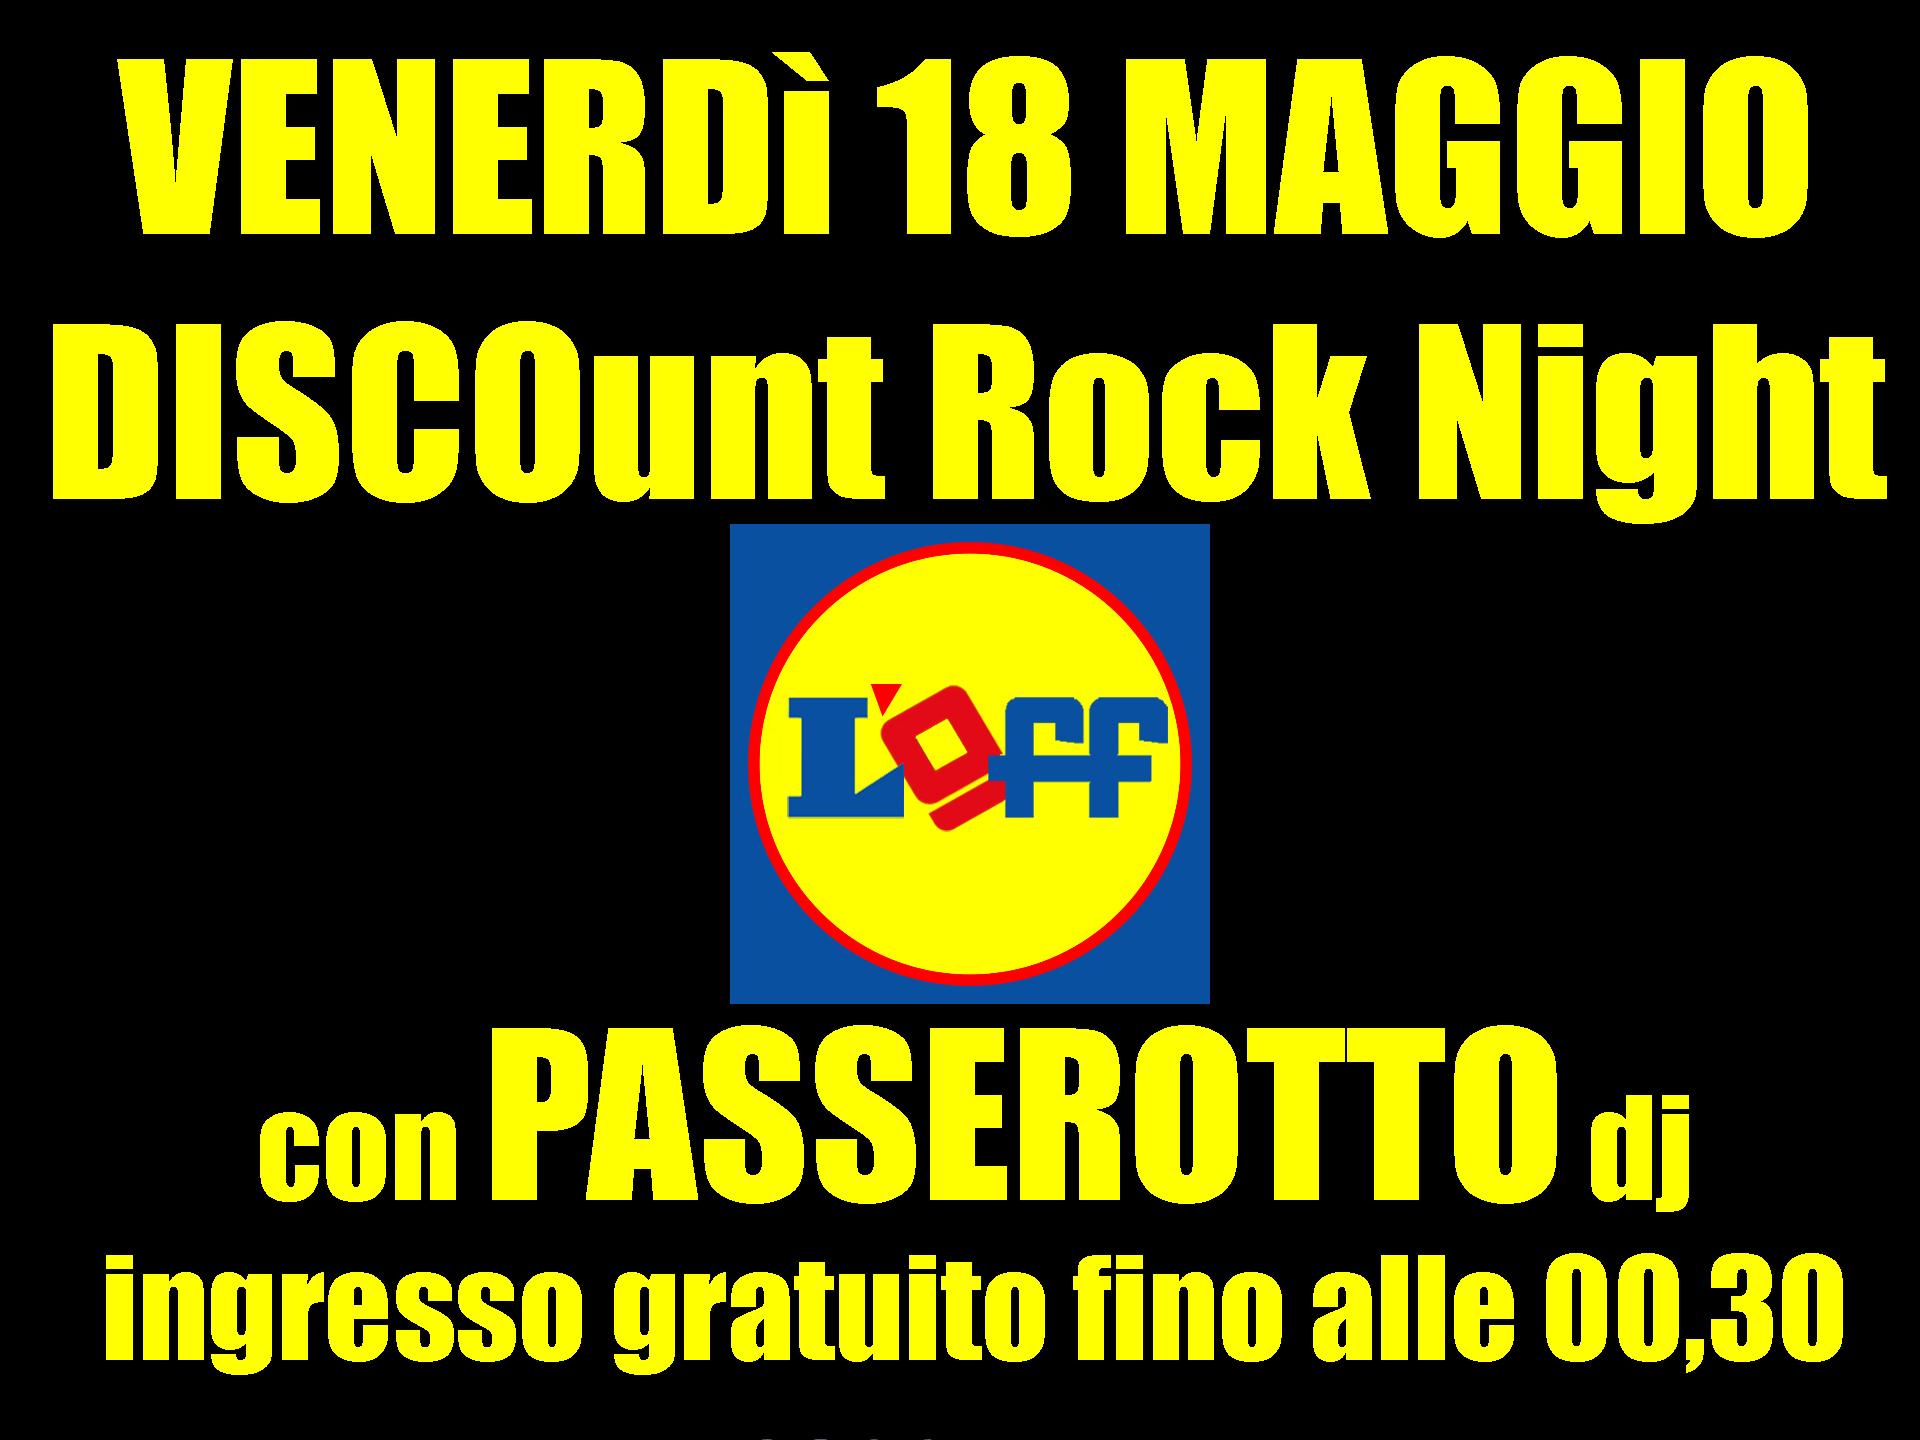 http://www.stoff.it/wp-content/uploads/2012/05/0518-Passerotto.jpg